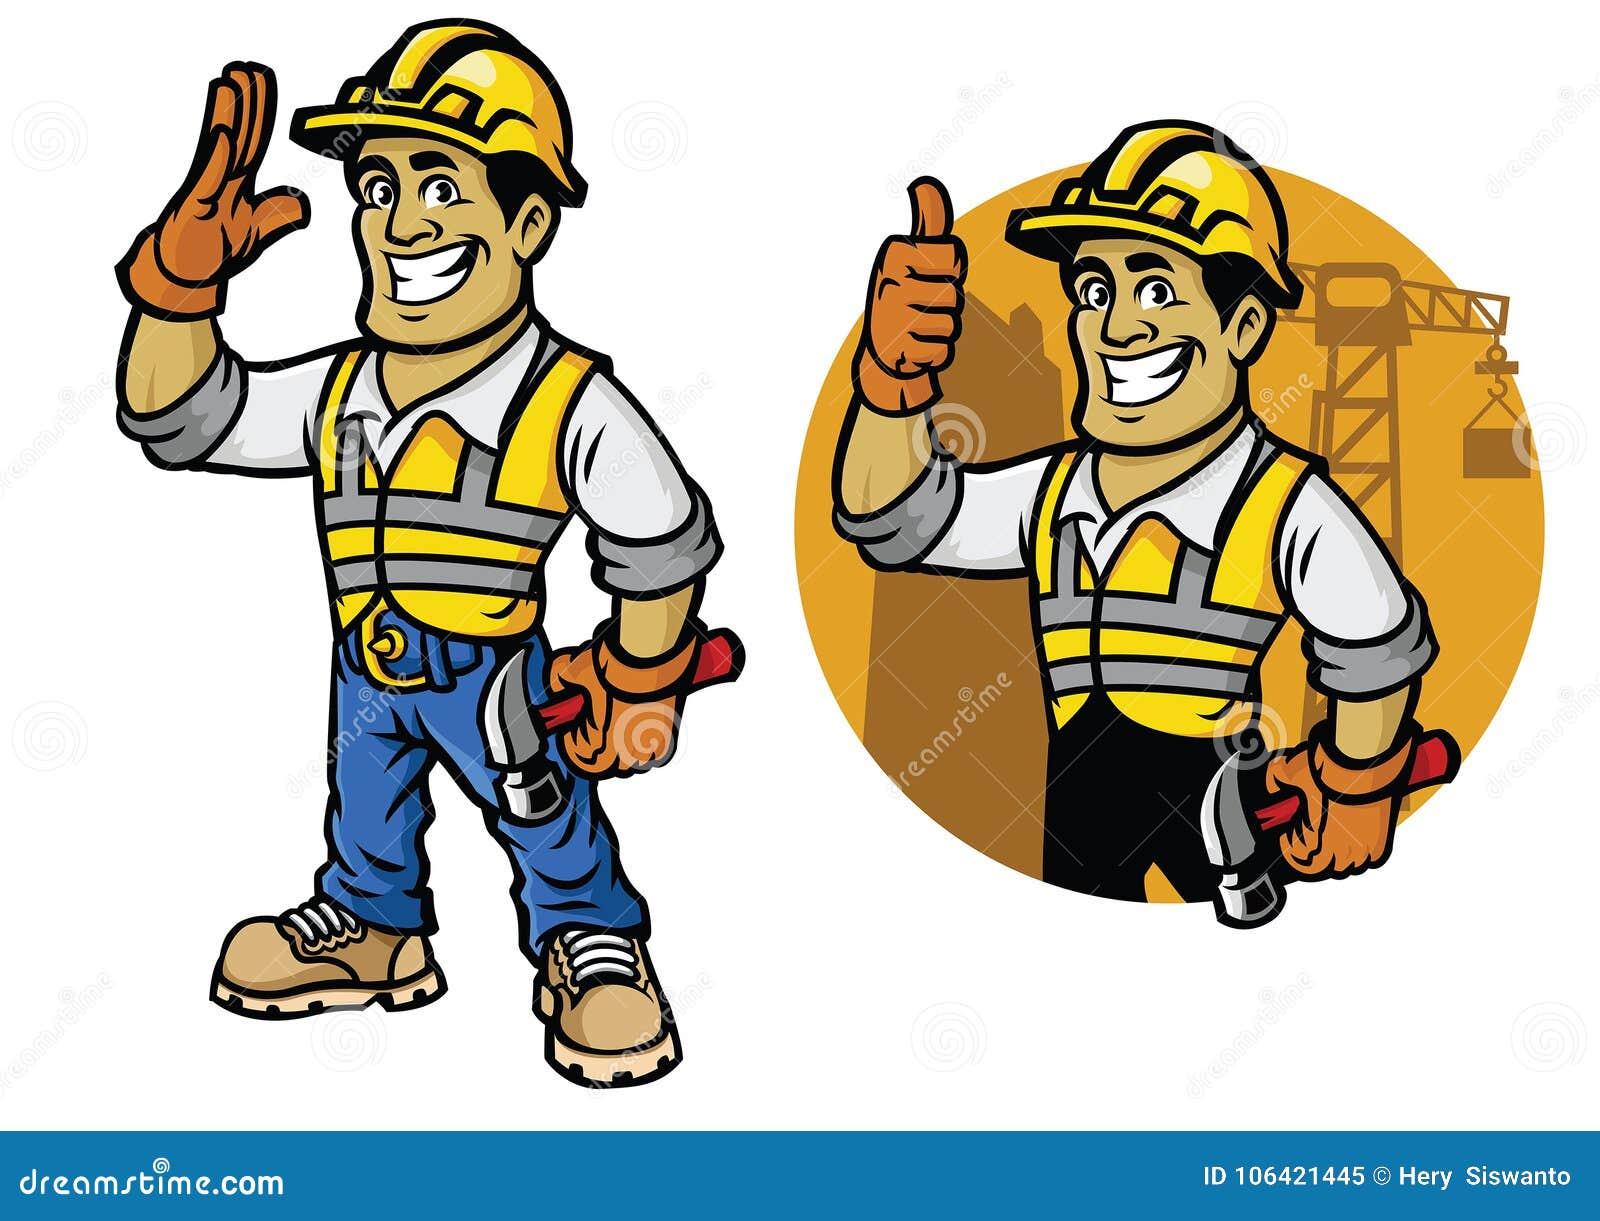 Cartoon Construction Worker Stock Illustrations 22 406 Cartoon Construction Worker Stock Illustrations Vectors Clipart Dreamstime